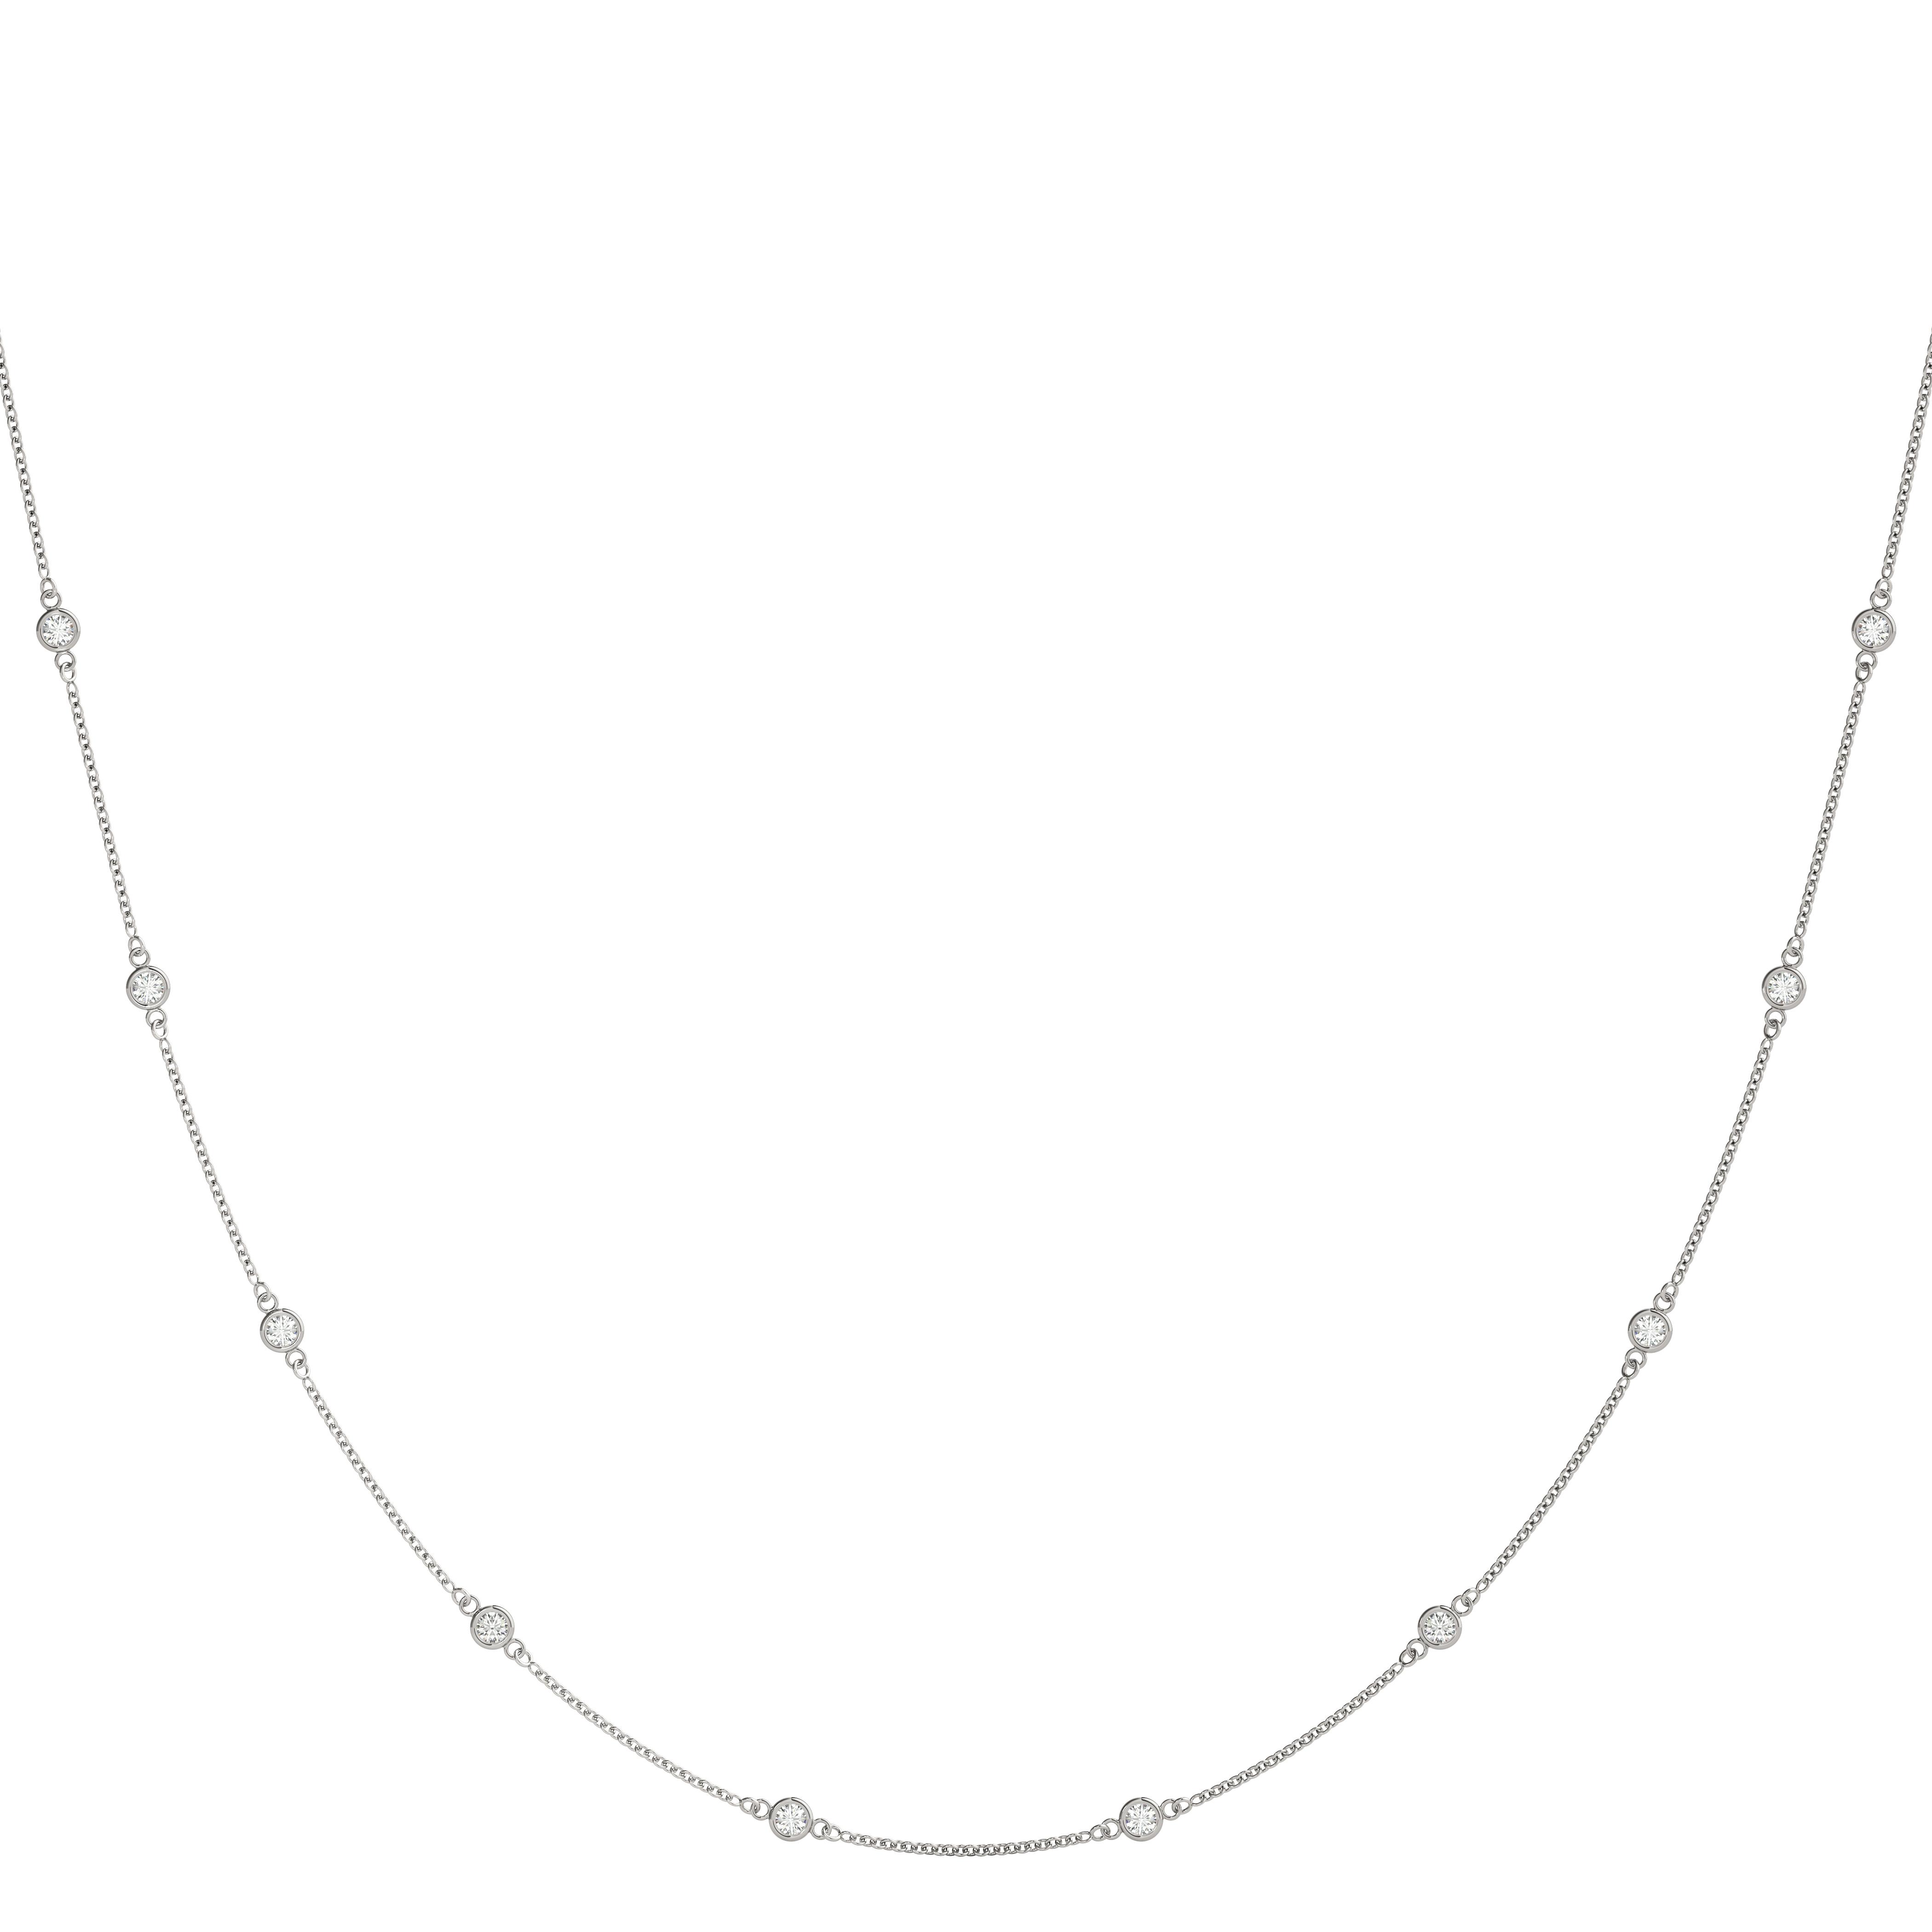 18k-white-gold-chain-diamond-necklace-60025-1